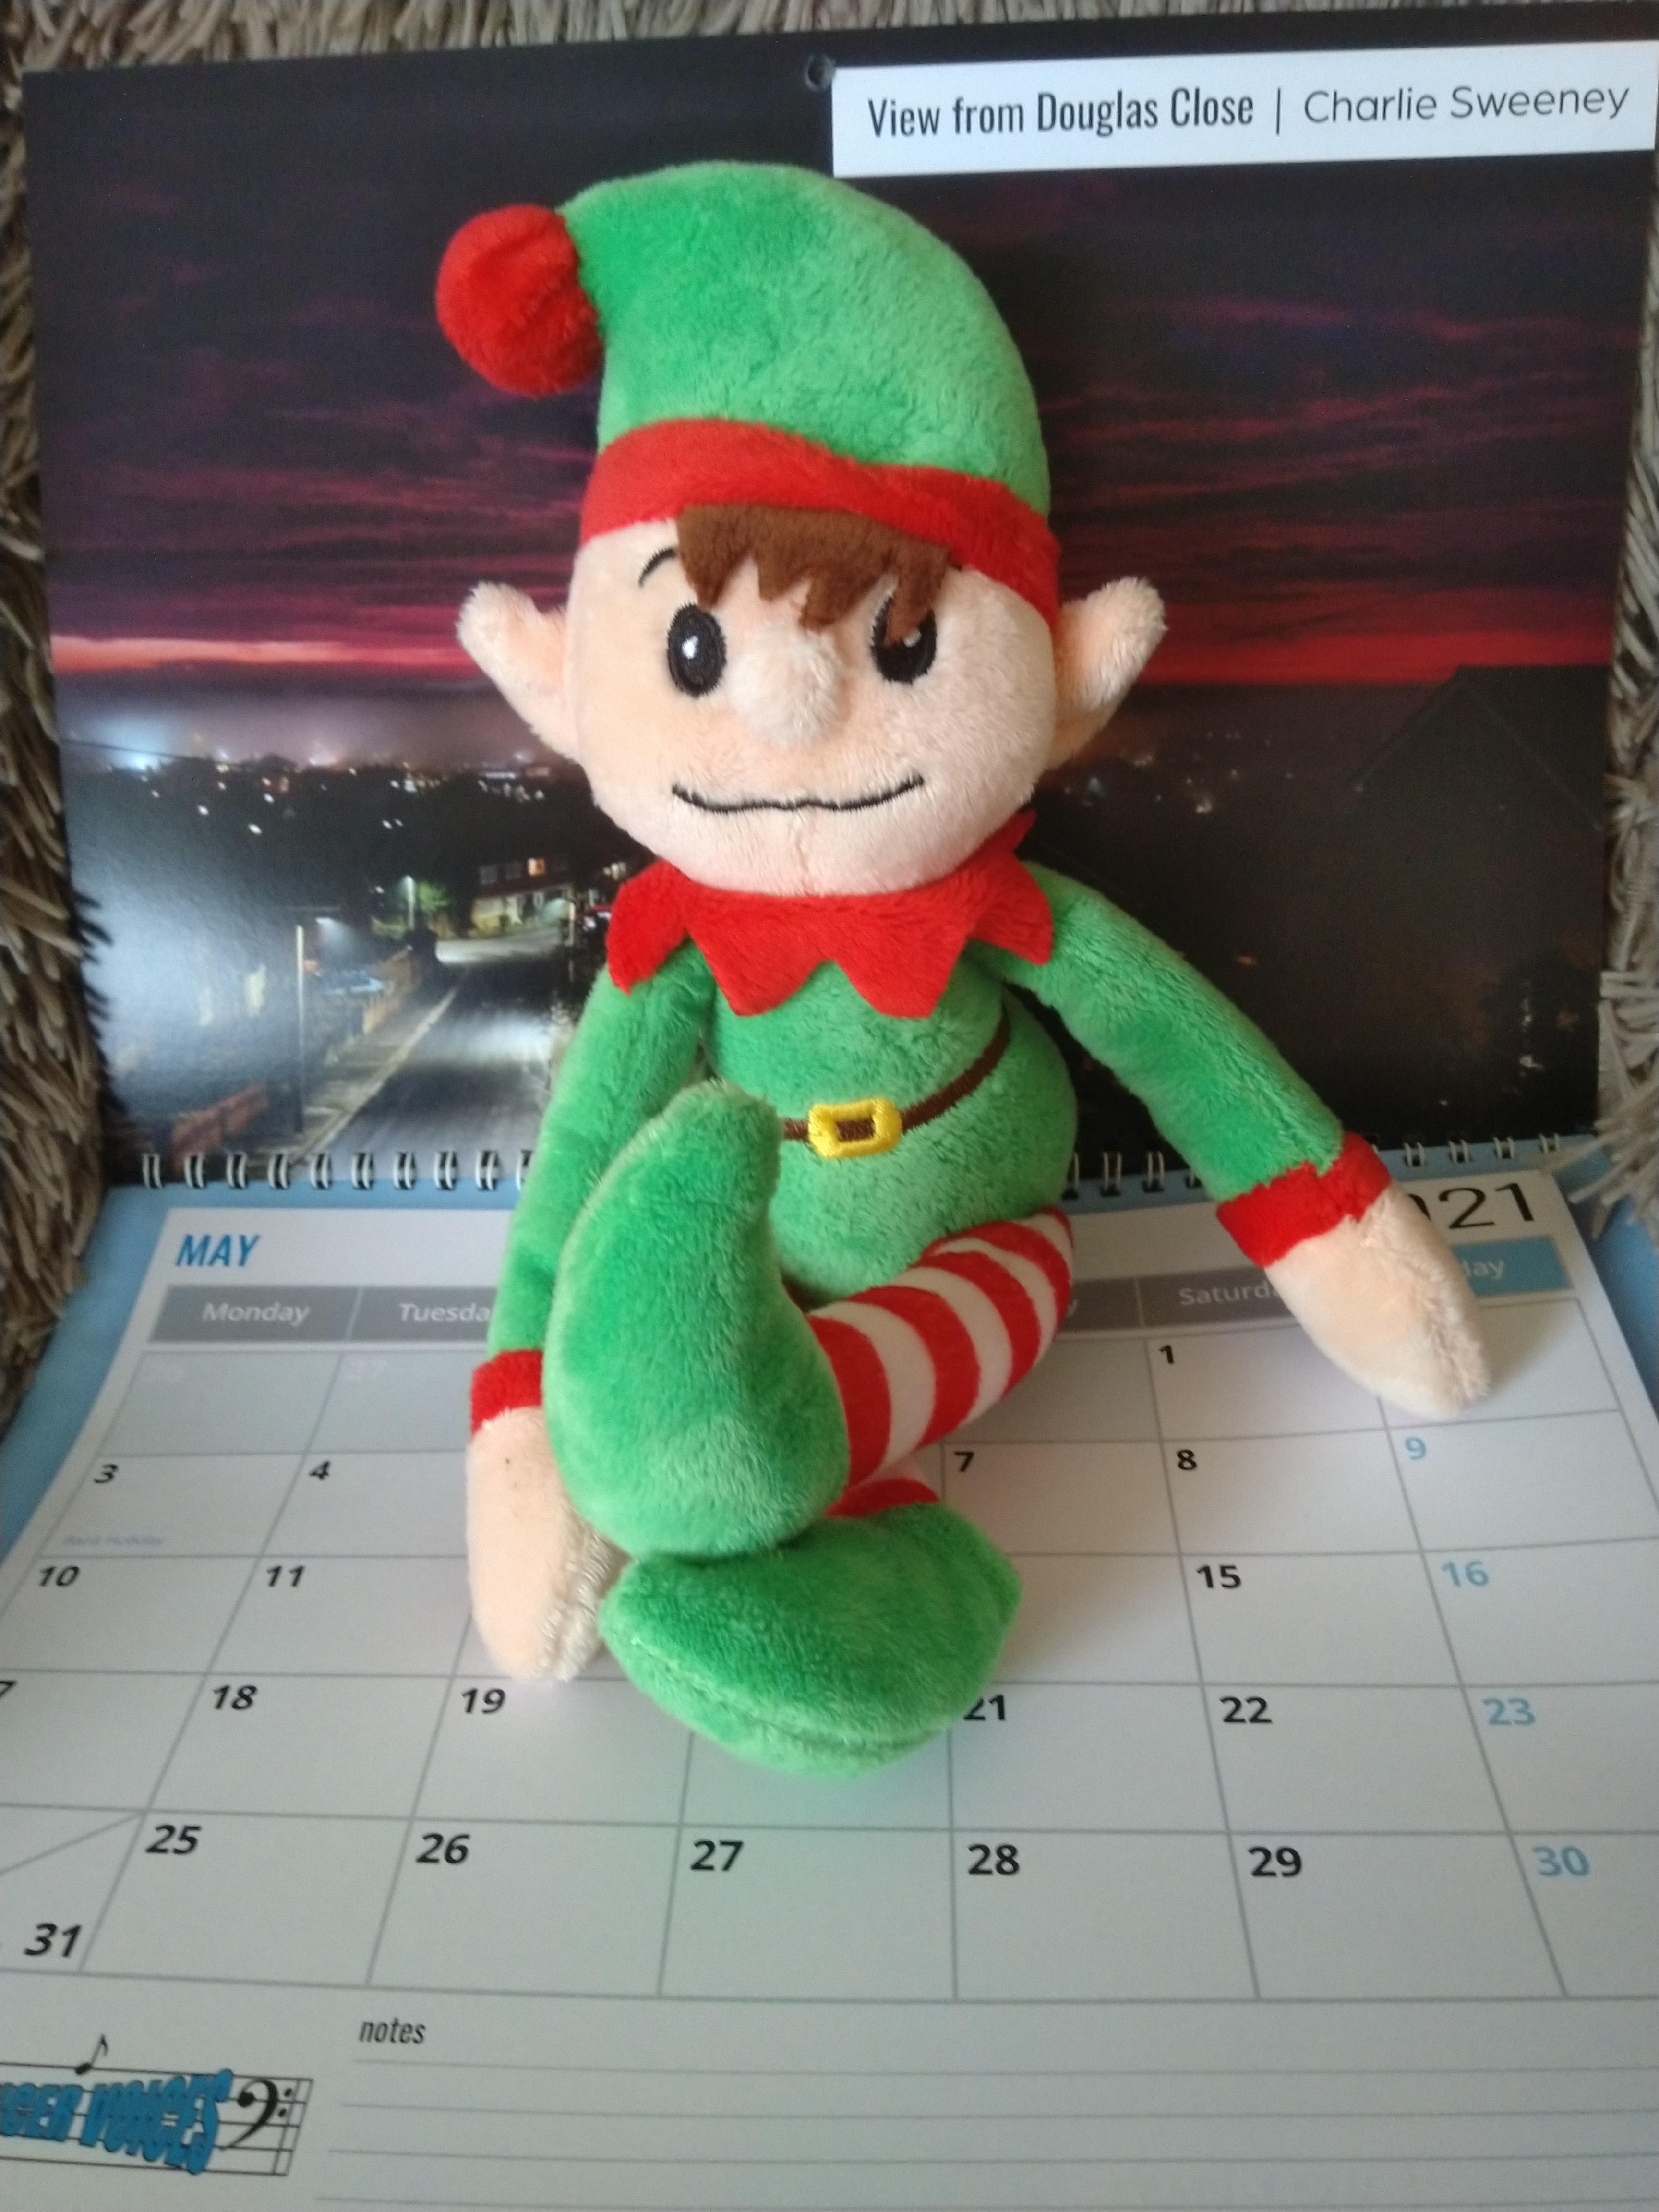 2 Alfie doing his bit to promote the Calendar